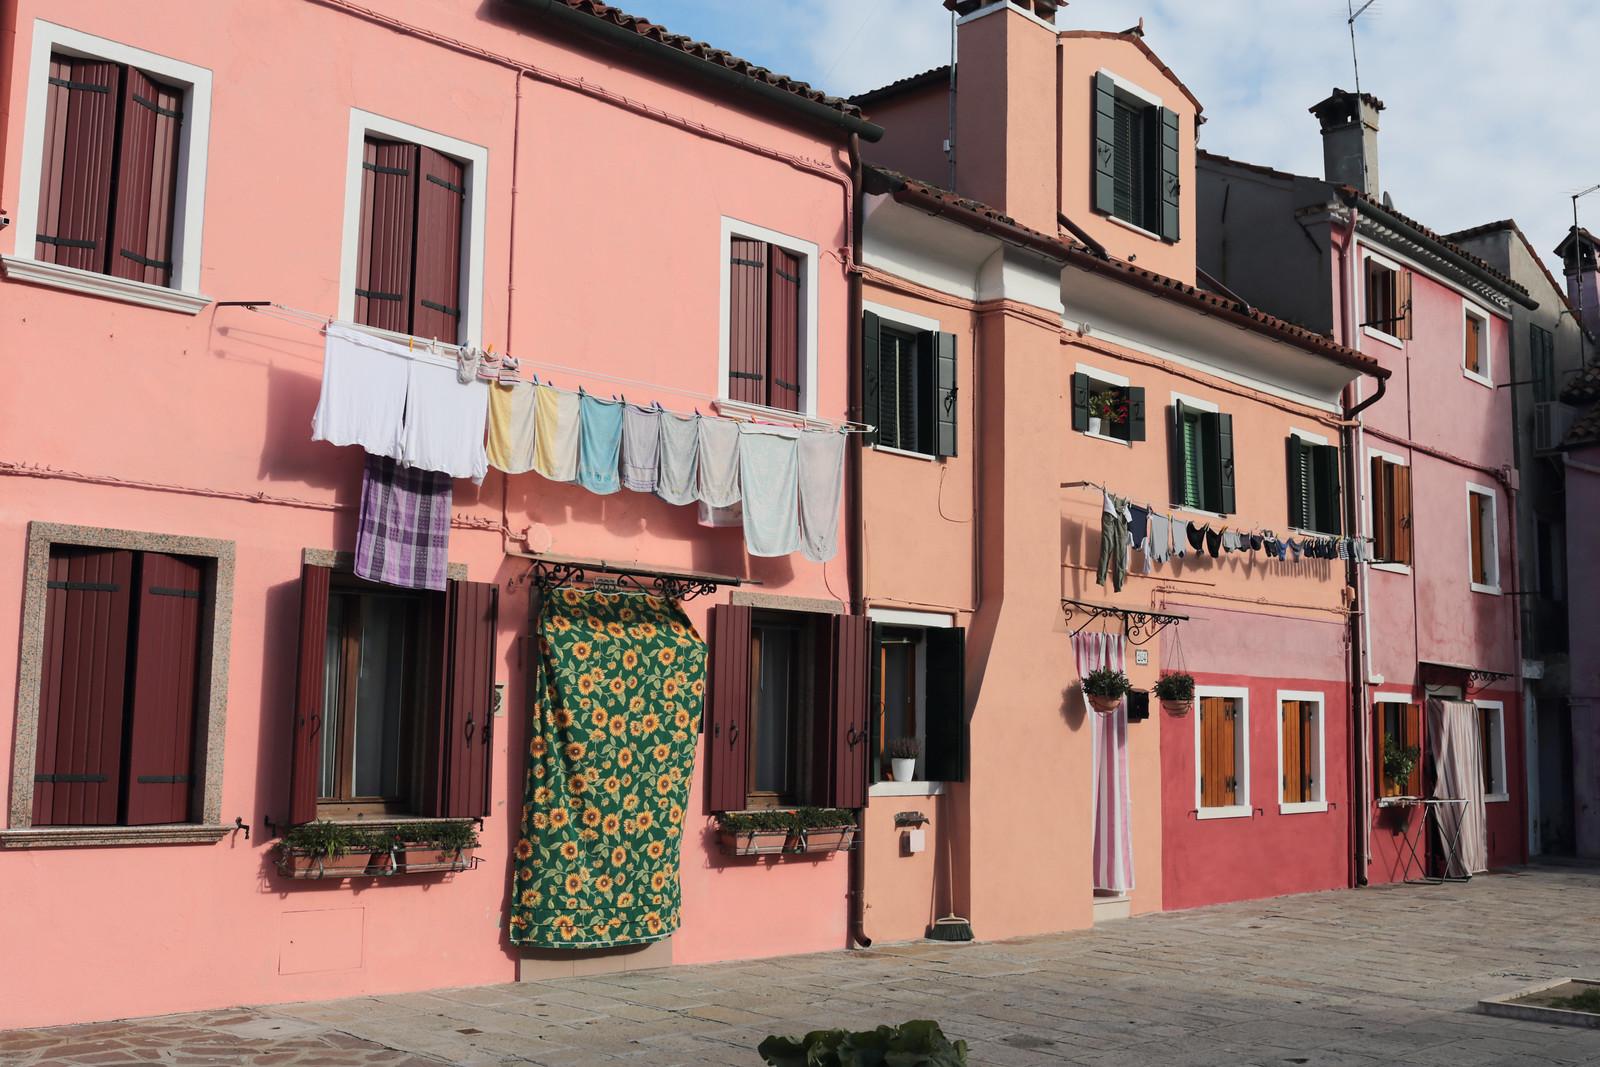 Venecia - Burano